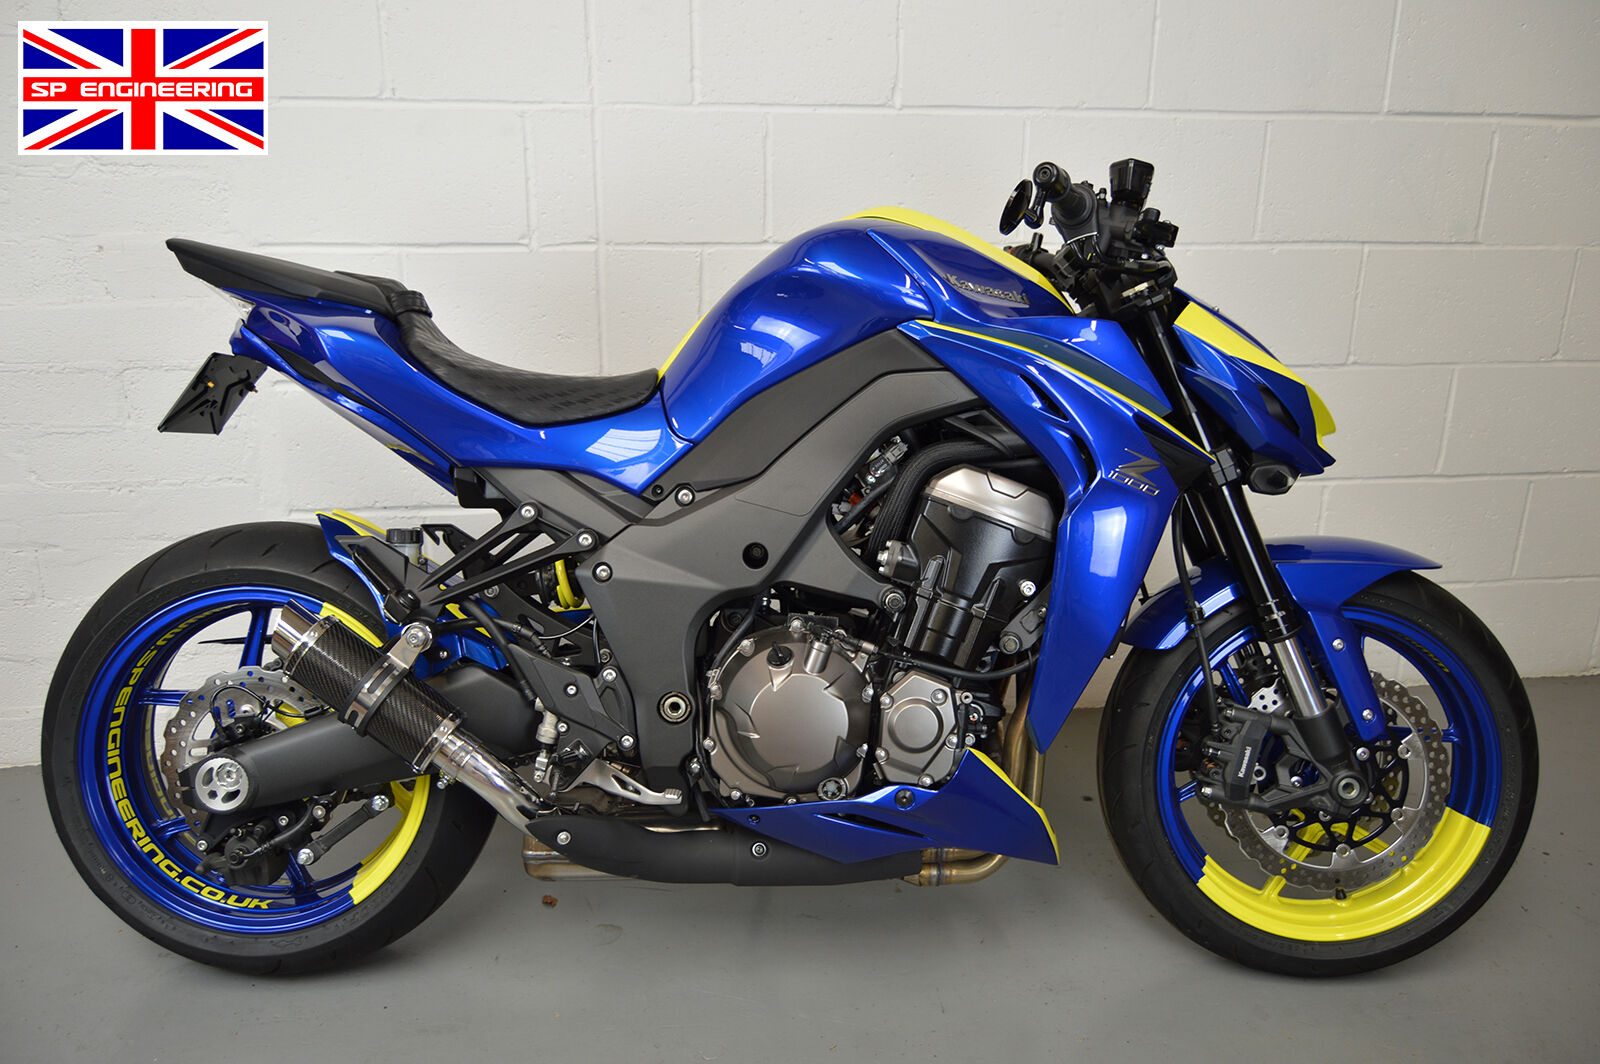 Details about Kawasaki Z1000 Exhausts 14-19 SP Engineering Carbon Fibre  Moto GP Xtreme